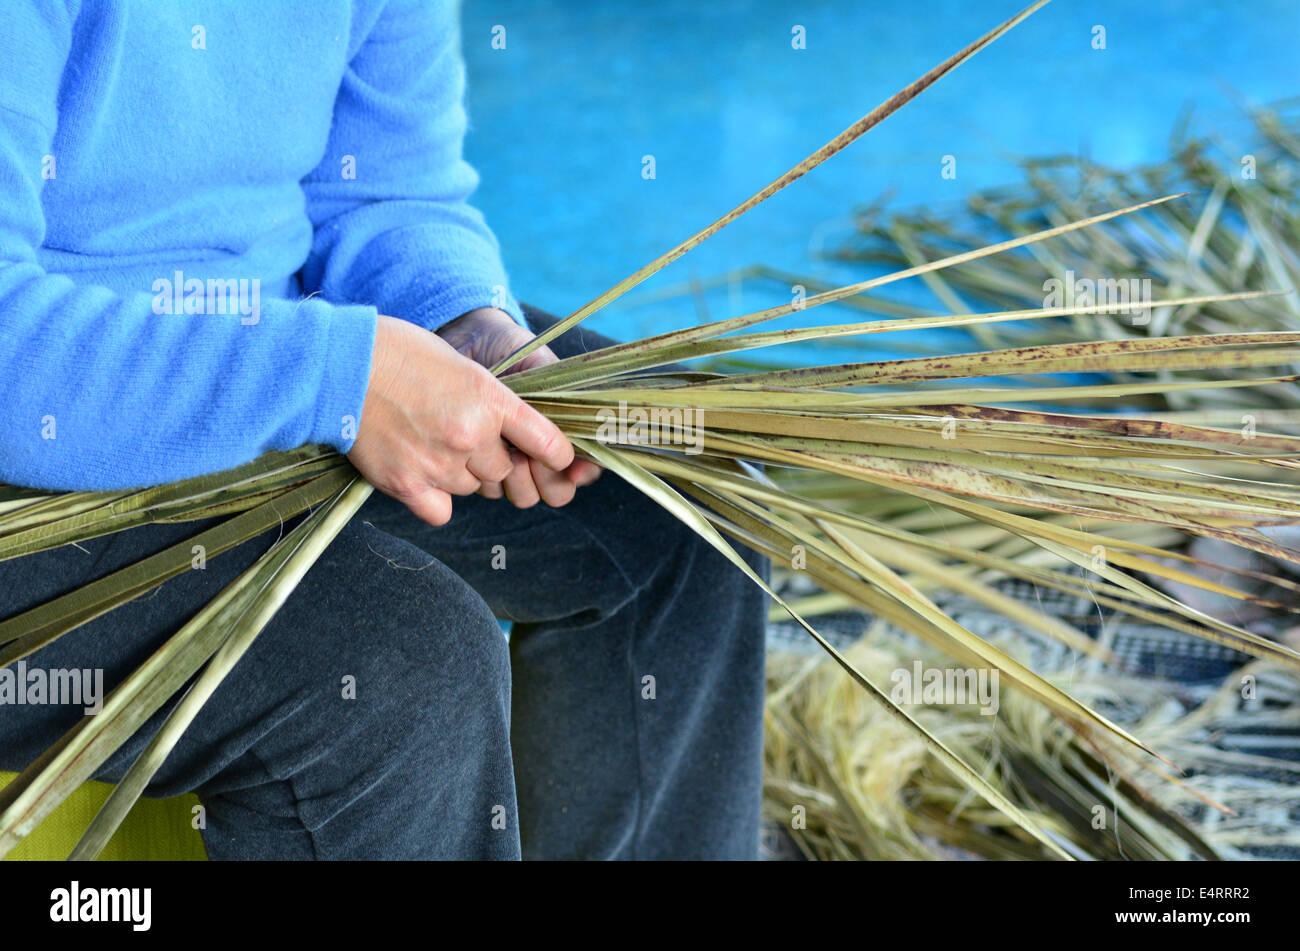 An old Maori woman weaving a traditional Maori woven artwork. - Stock Image